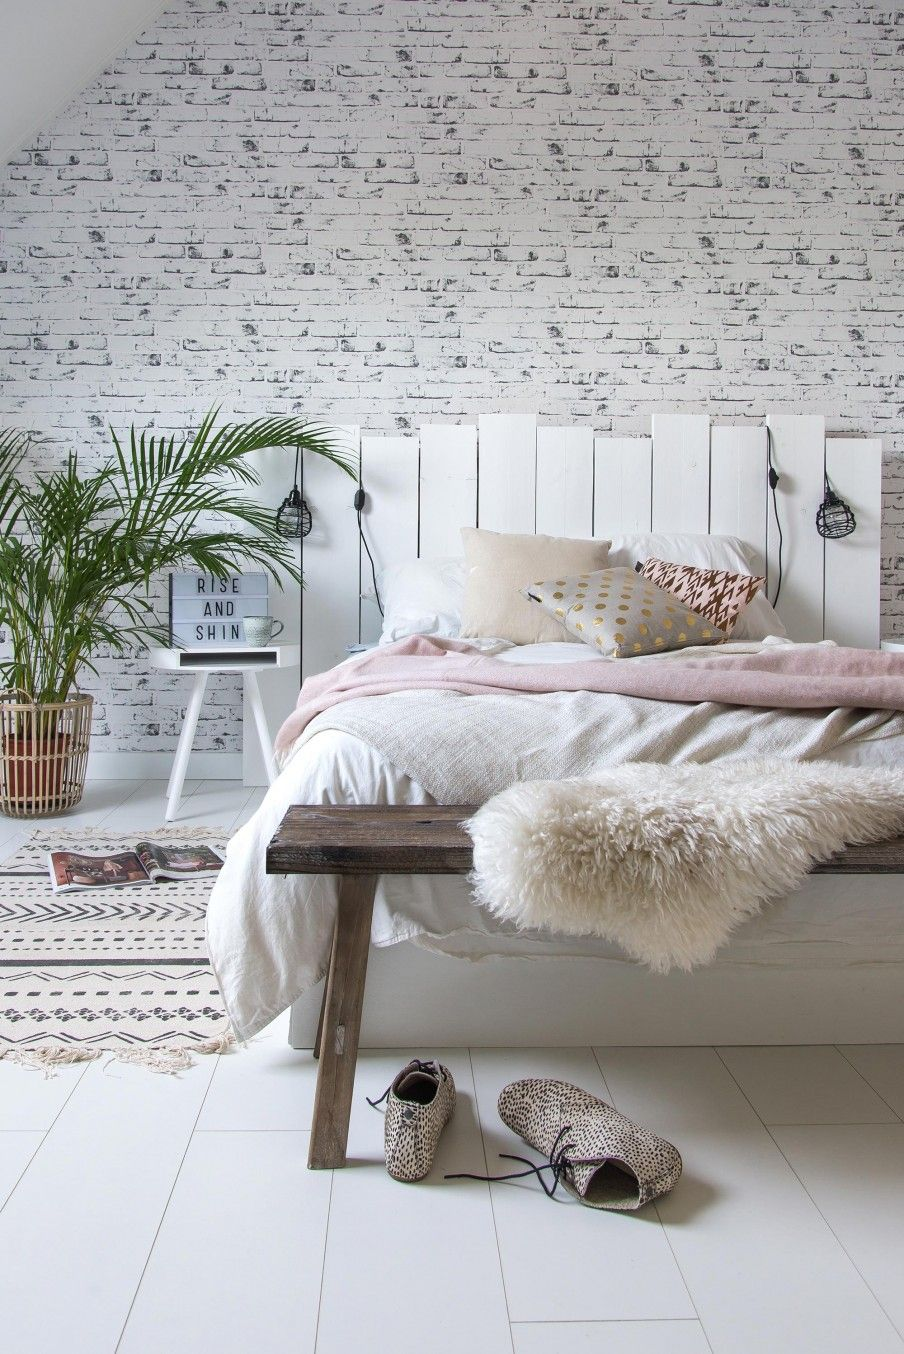 diy hoofdbord bedroom inspiration vtwonen 11 2016 fotografie en styling